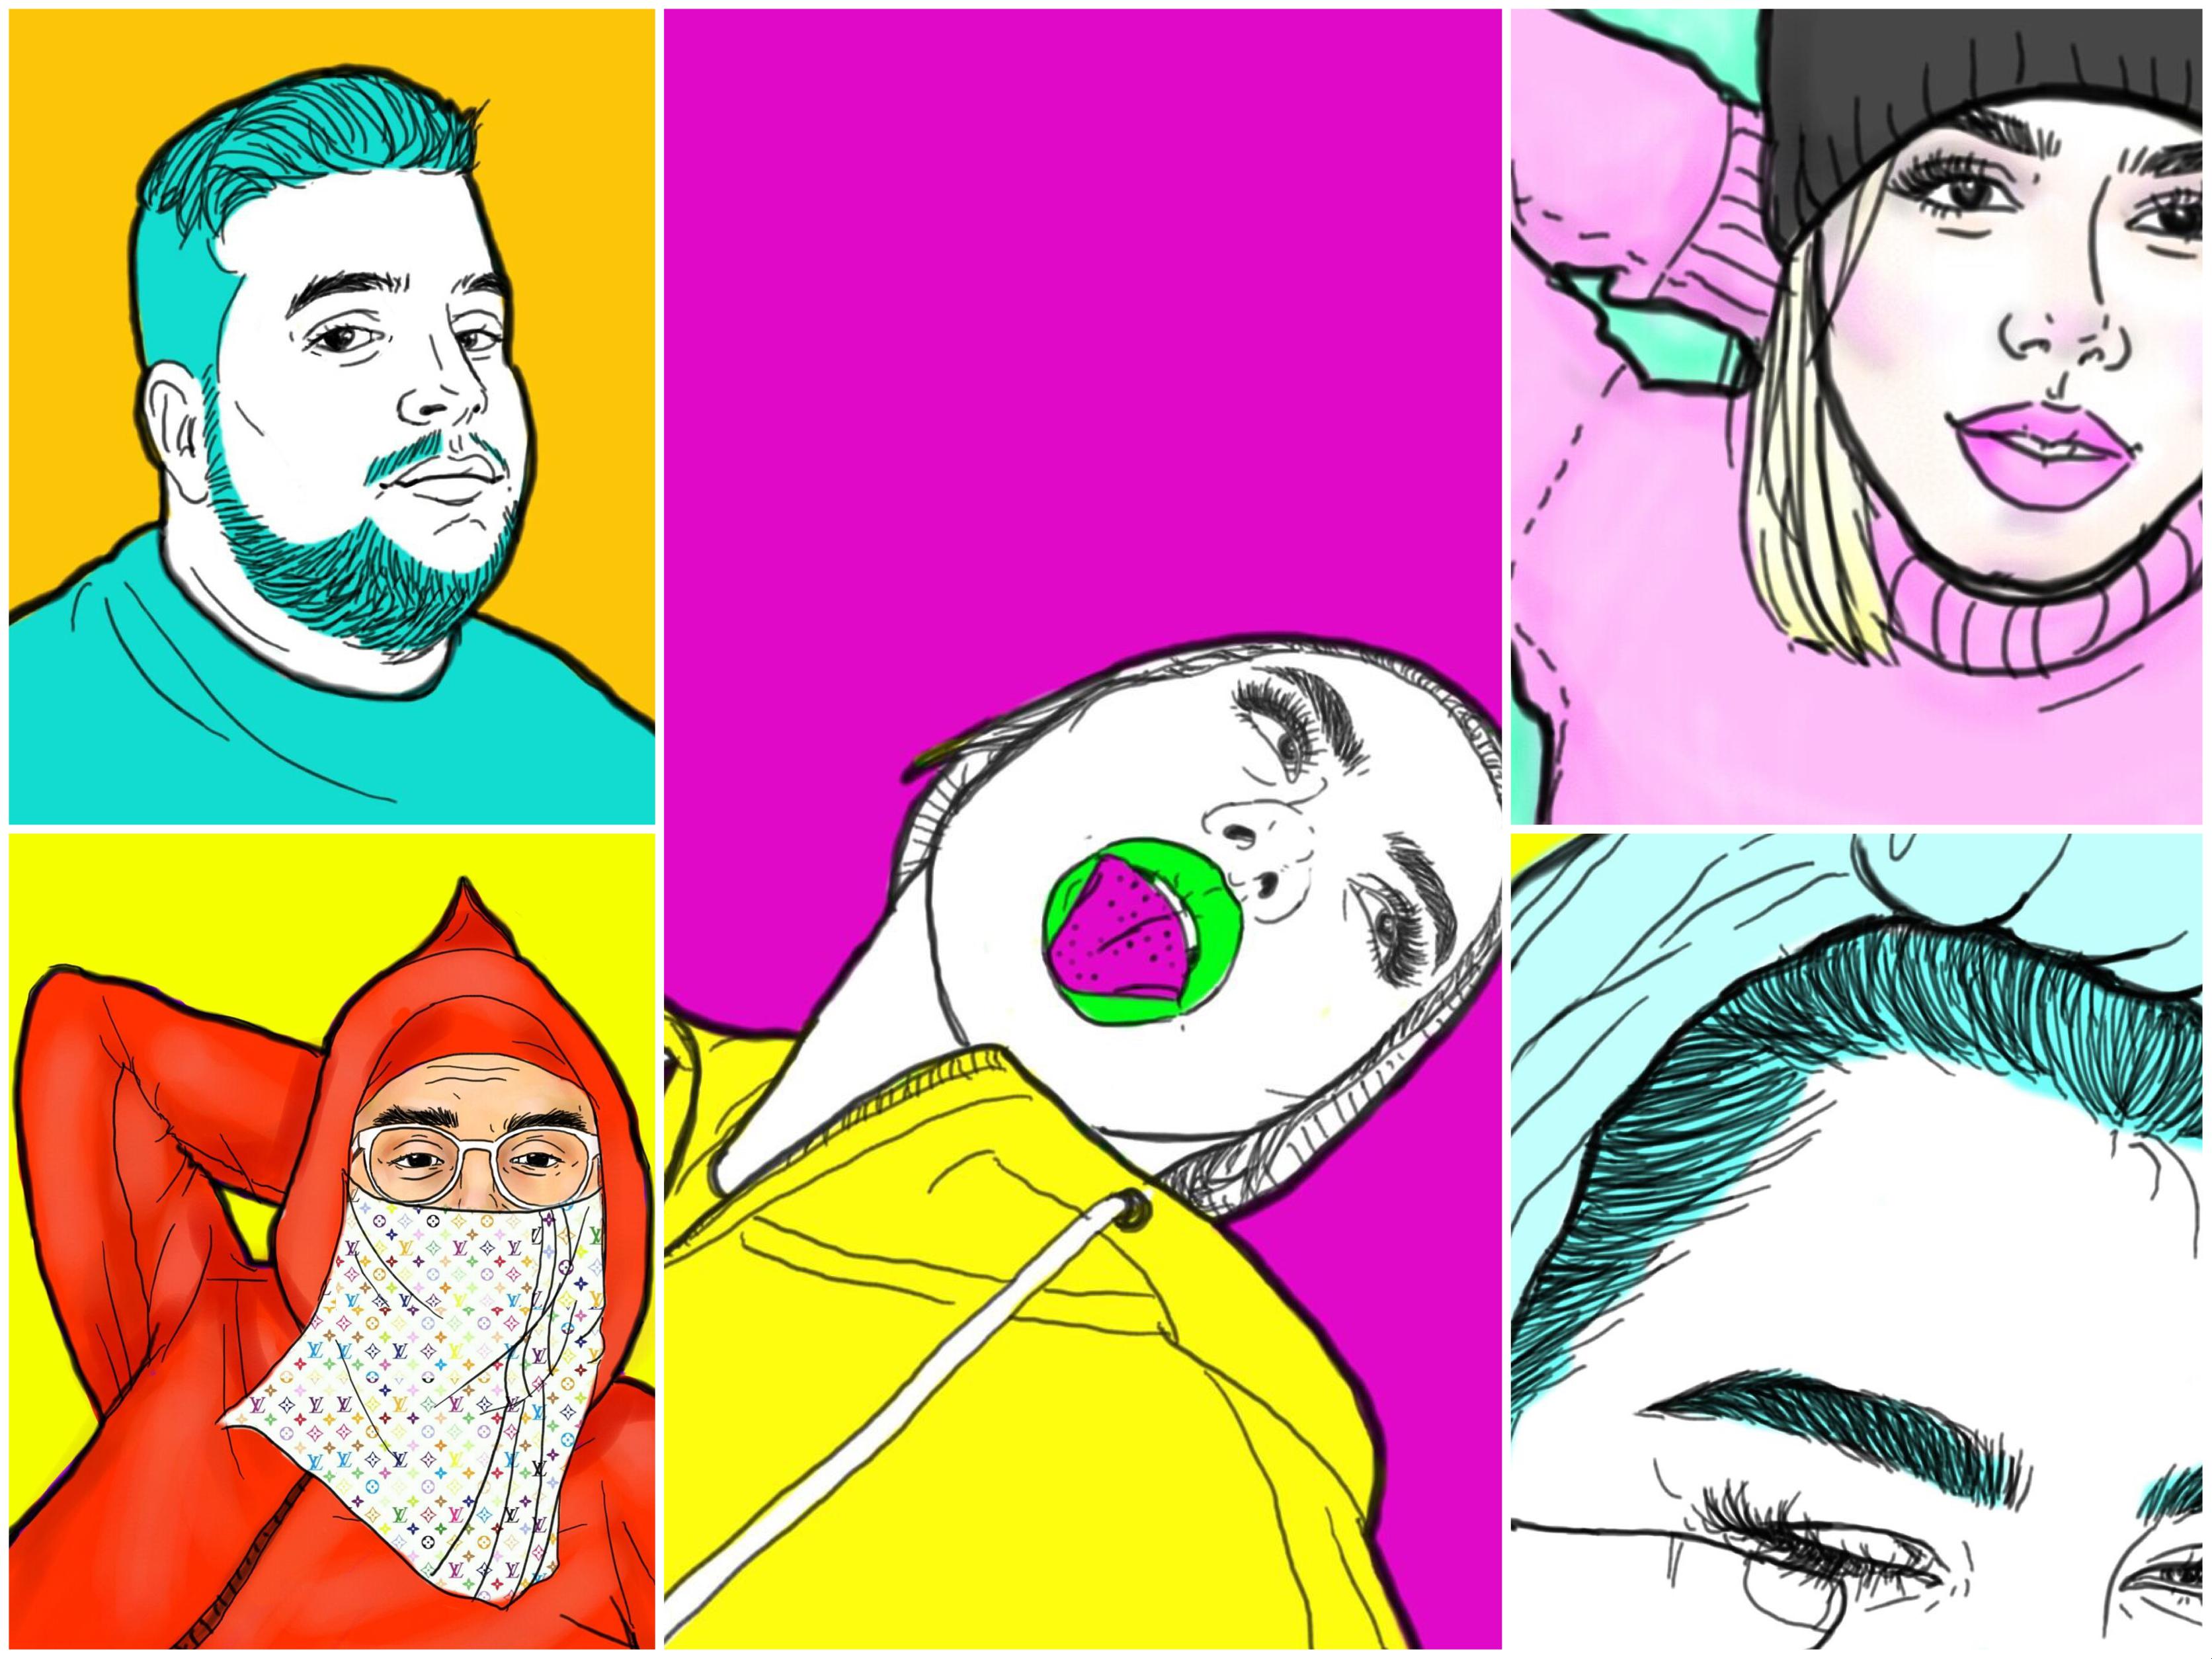 Jaula Humaima Albakali Tahar @umimi1 Draw Artist on PicsArt